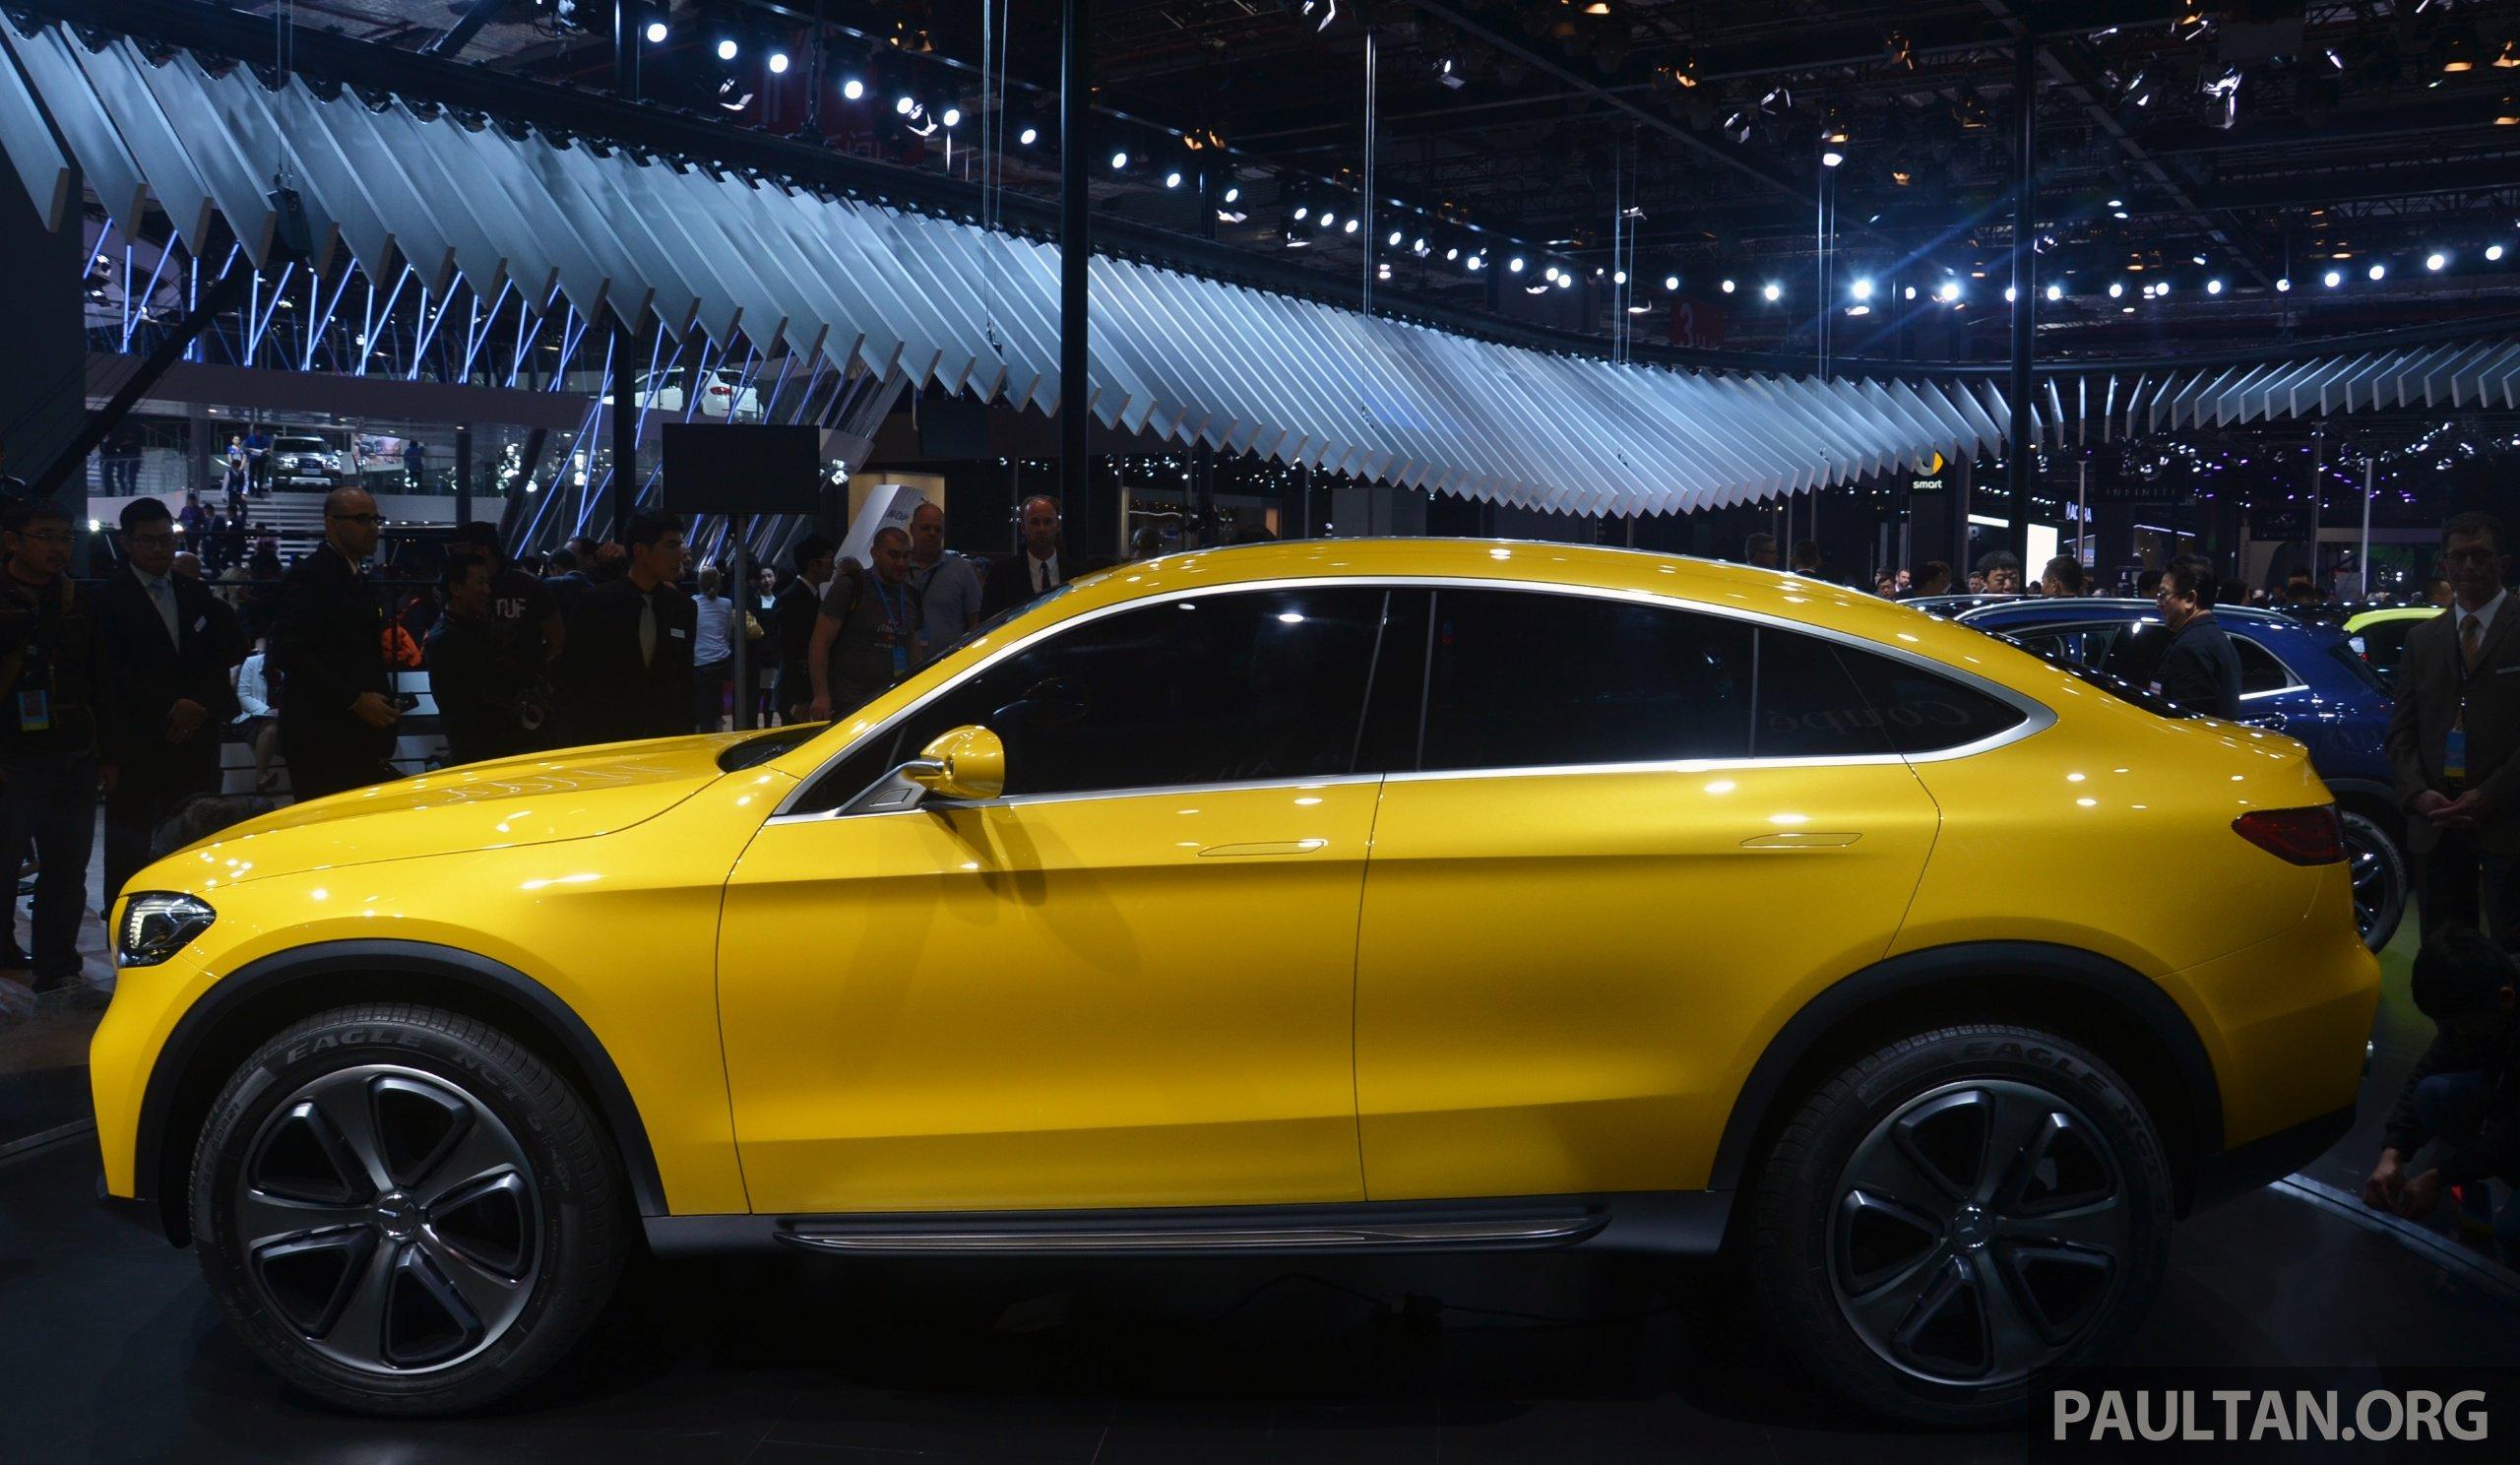 https://s3.paultan.org/image/2015/04/mercedes-benz-glc-coupe-concept-shanghai-1214.jpg